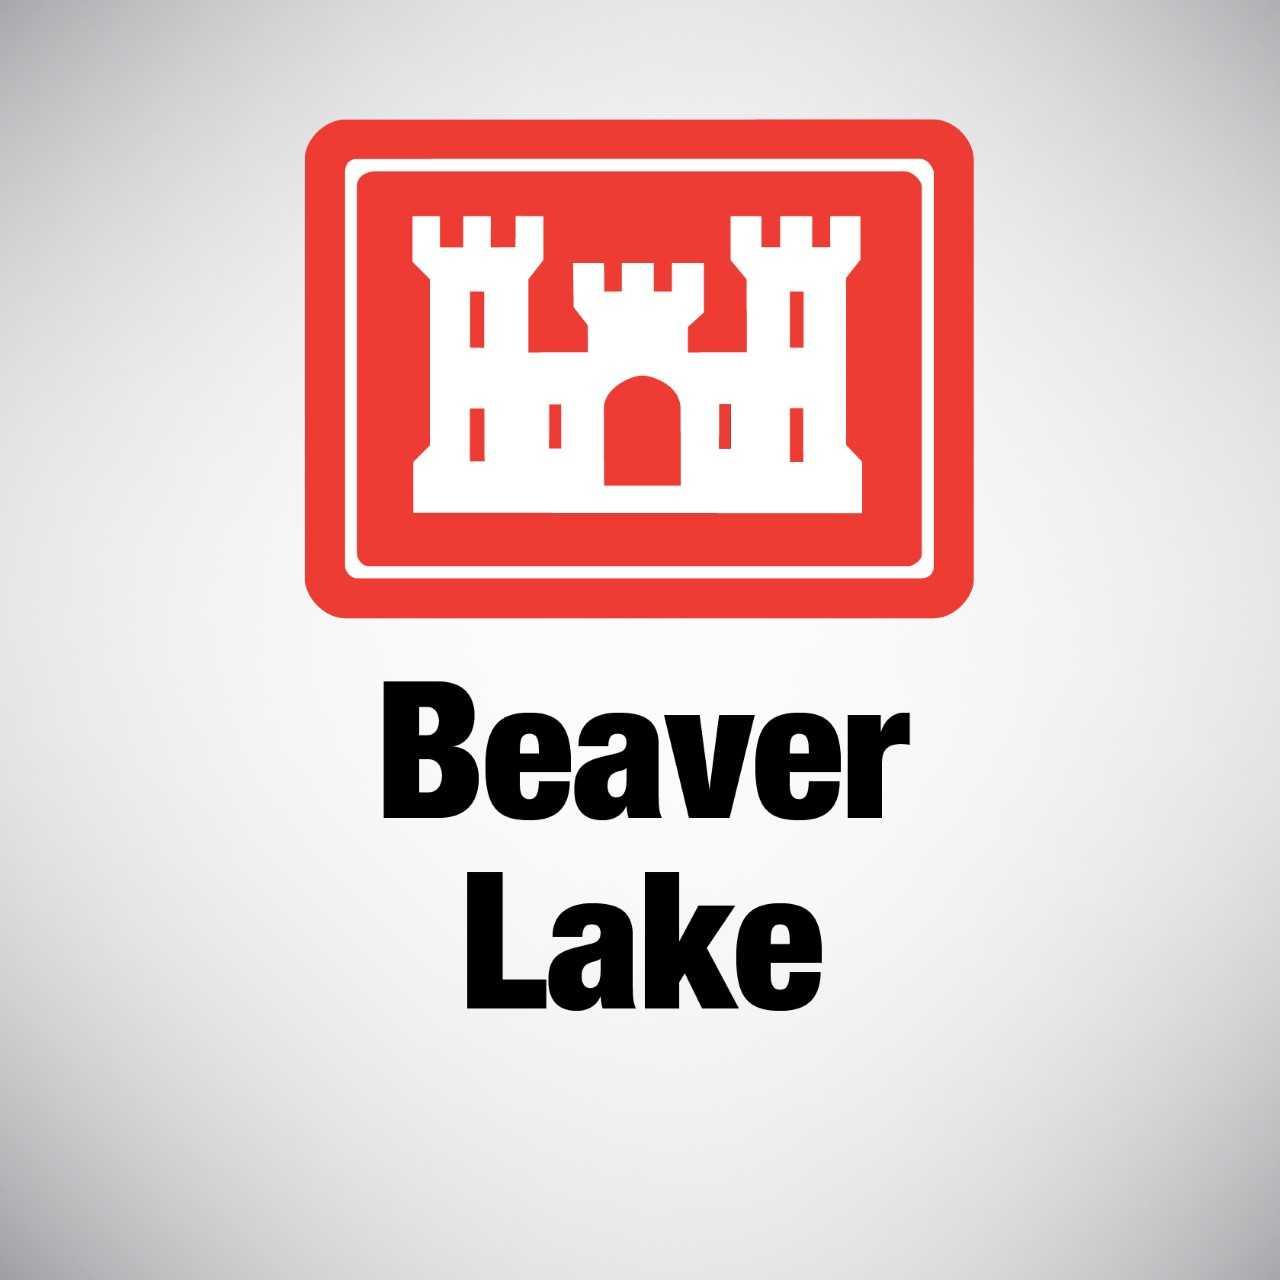 beaver lake corps_1561318929266.jfif.jpg